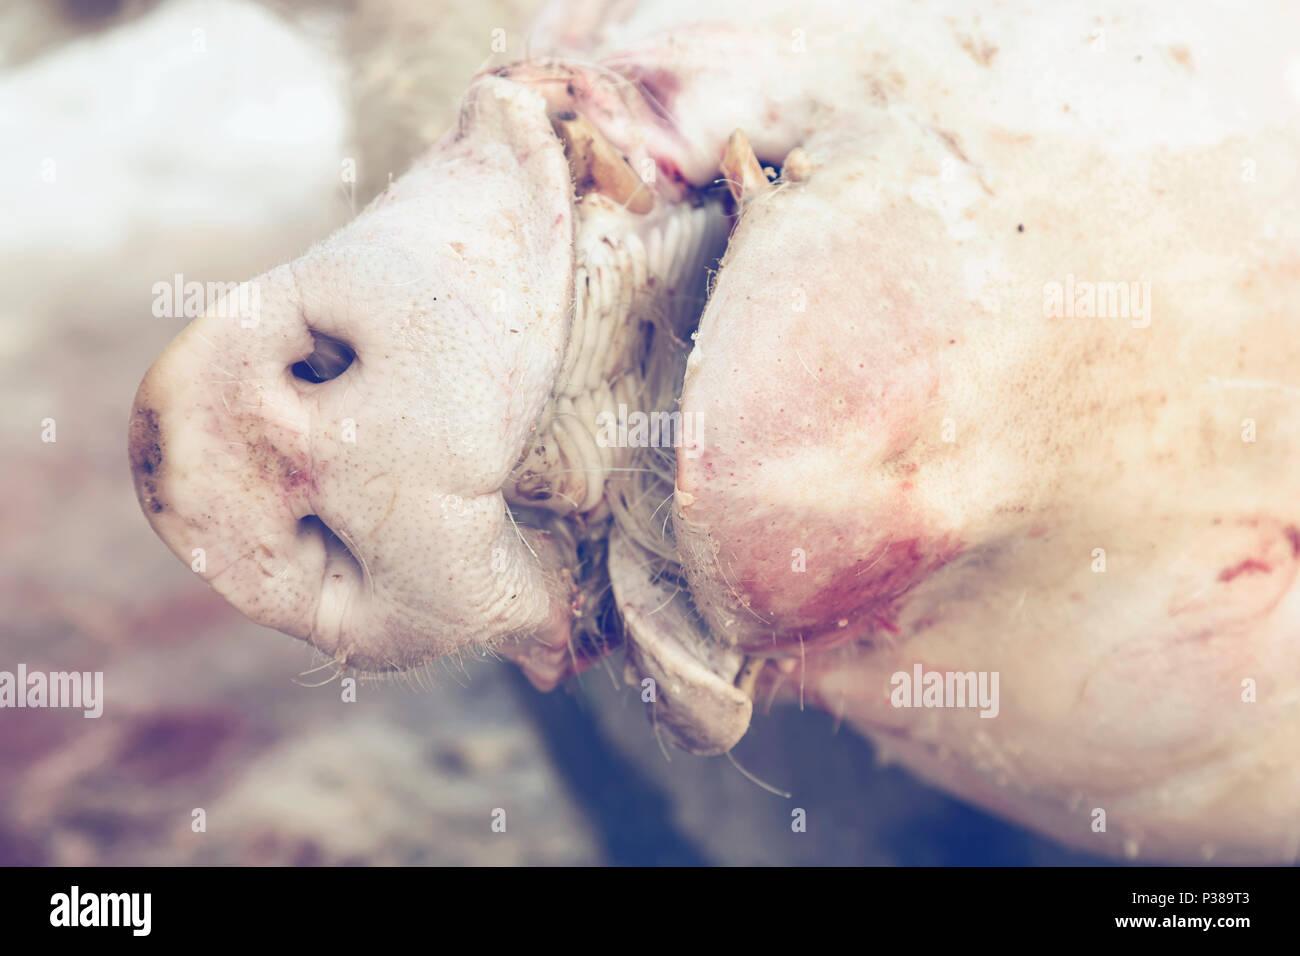 Butchering Slaughter Stock Photos Amp Butchering Slaughter